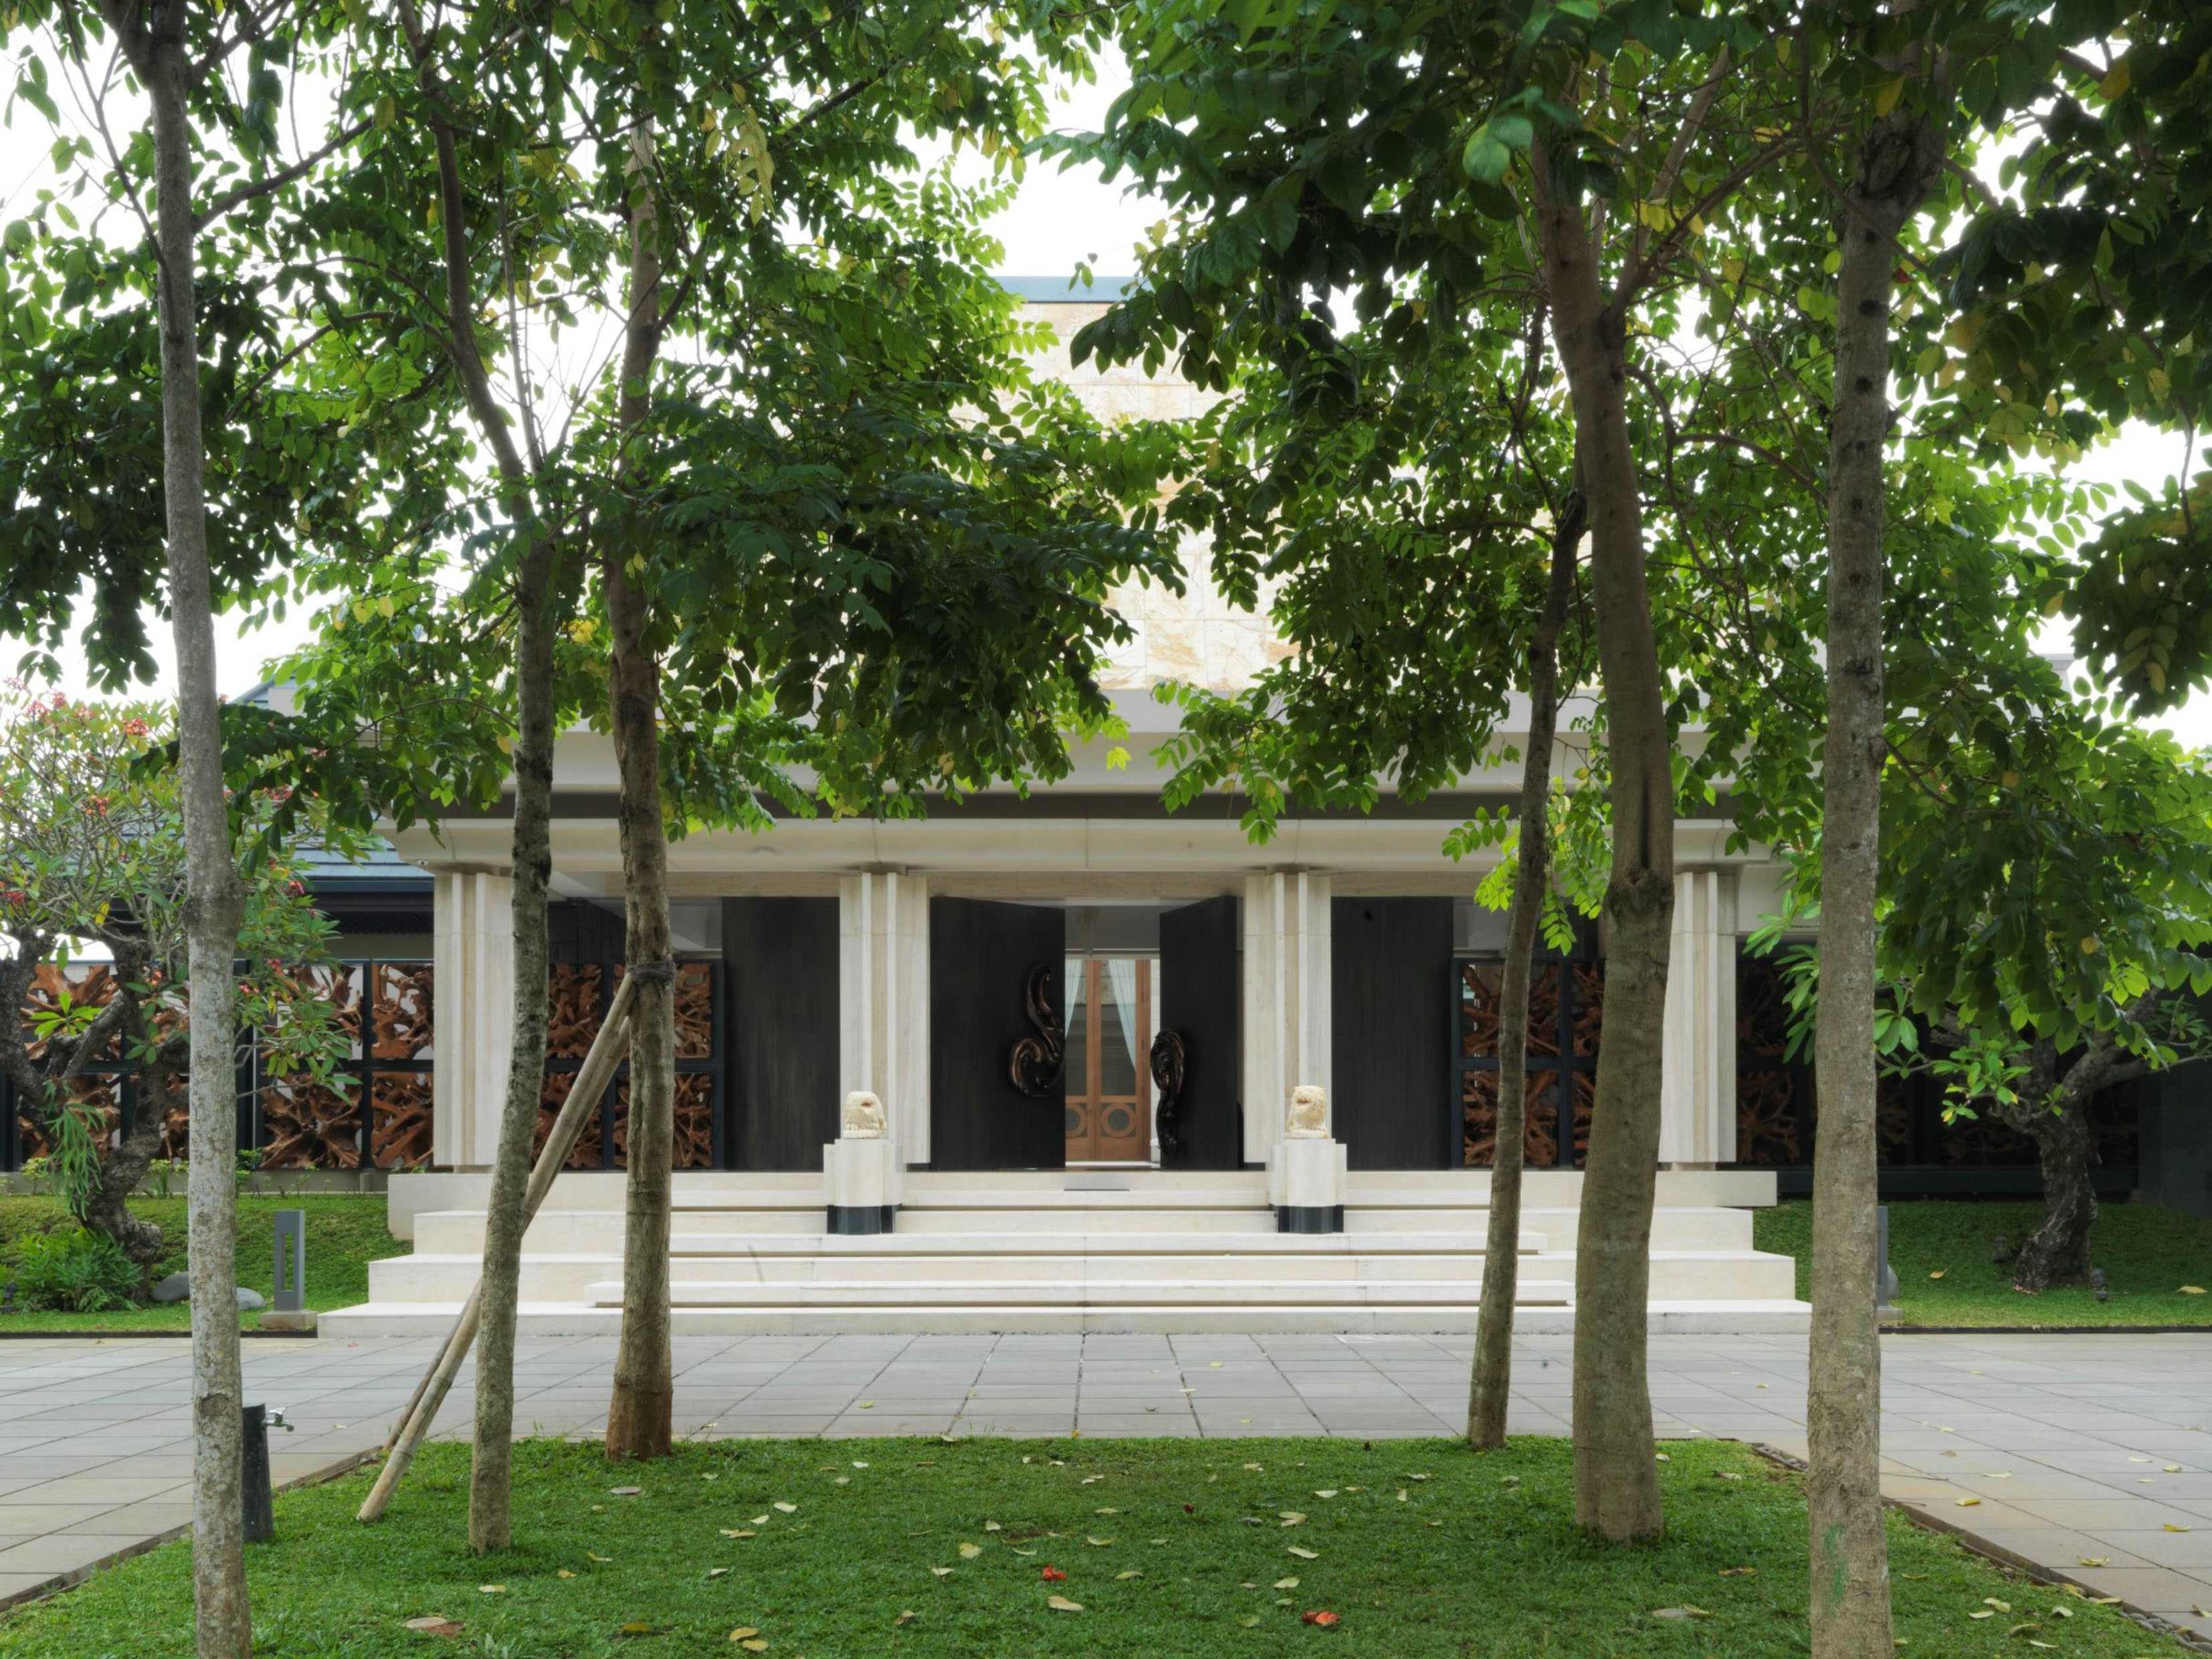 Studio Air Putih Dh_House Argopuro, Semarang Argopuro, Semarang Terrace Klasik  25127